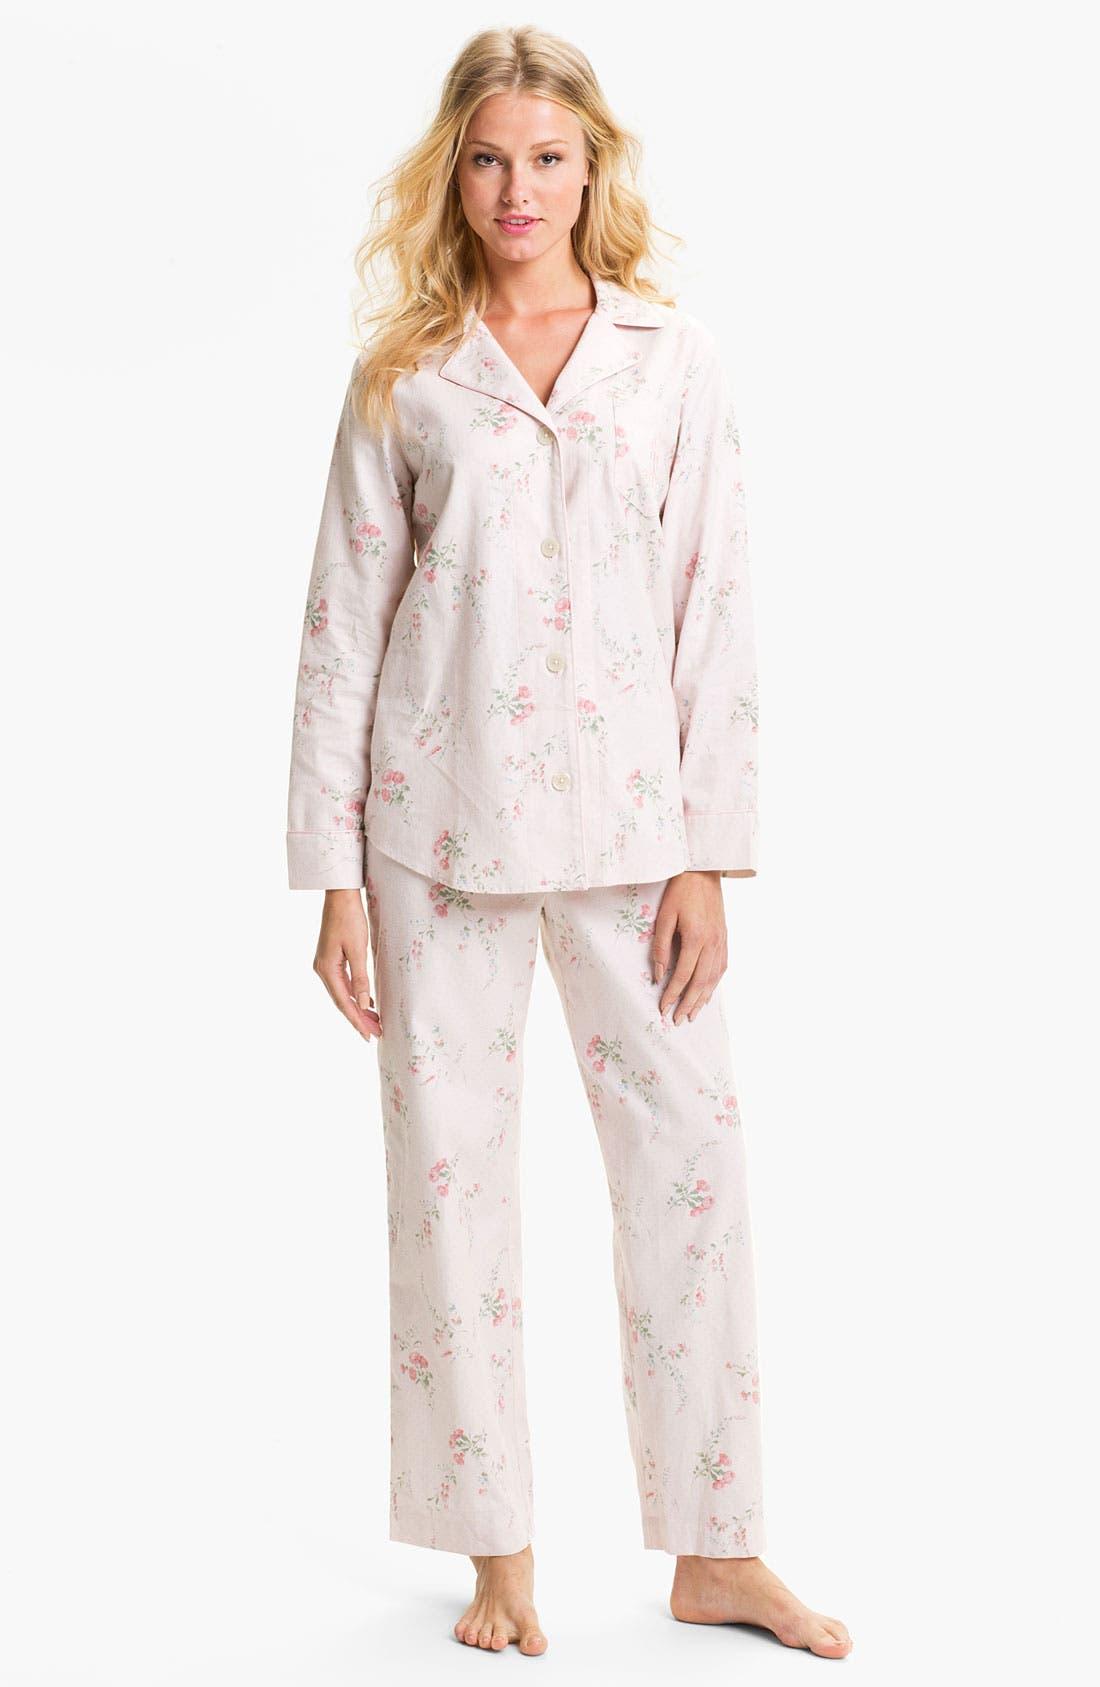 Alternate Image 1 Selected - Lauren Ralph Lauren Sleepwear Pattern Brushed Twill Pajamas